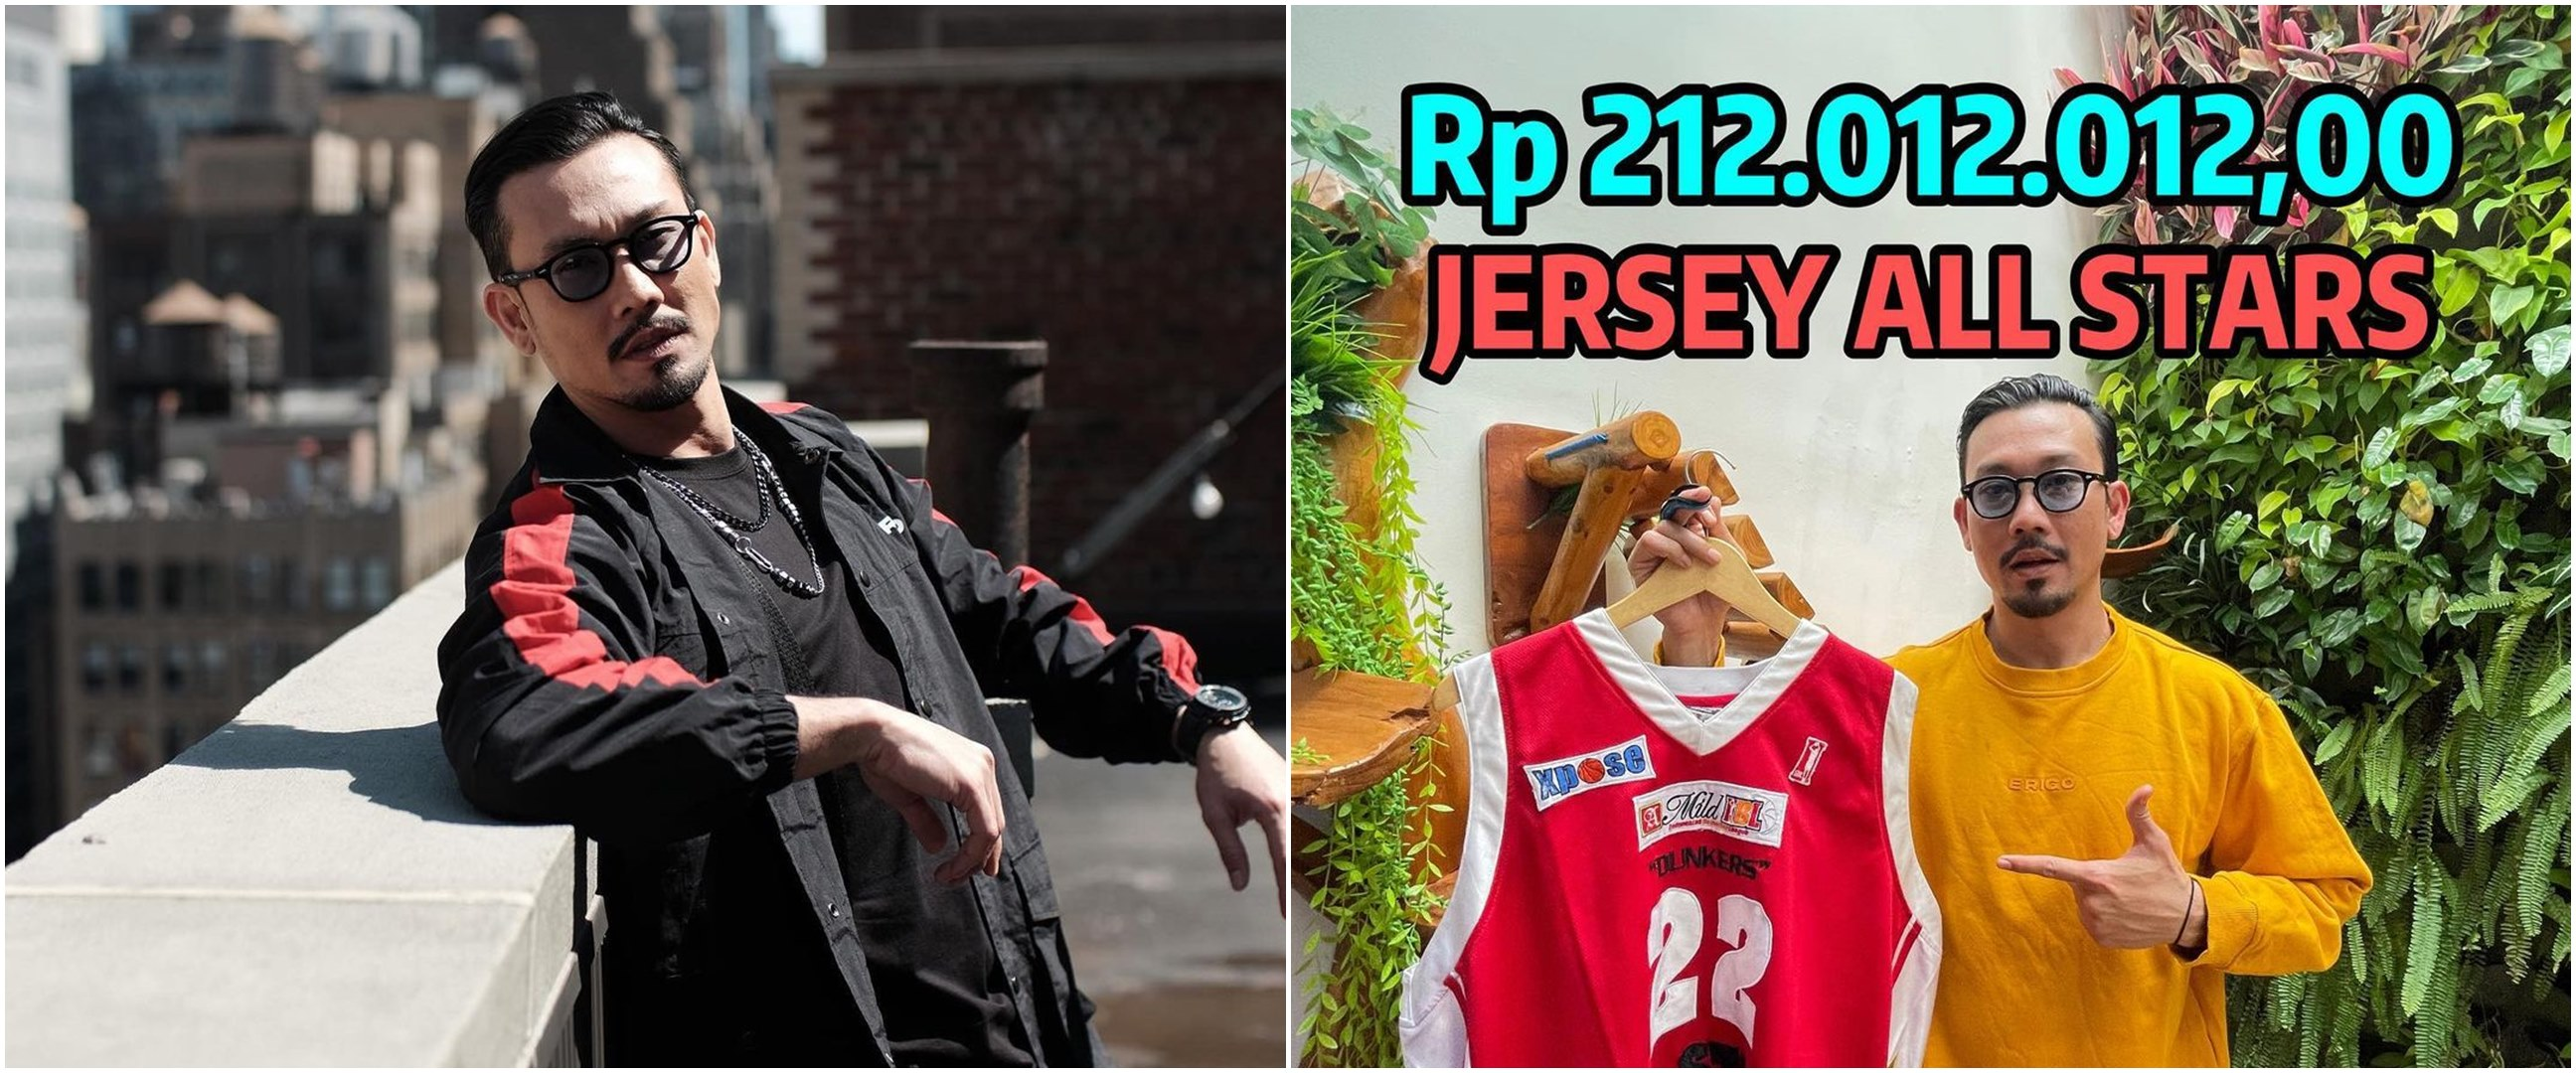 5 Fakta Denny Sumargo lelang jersey kesayangan, laku Rp 210 juta